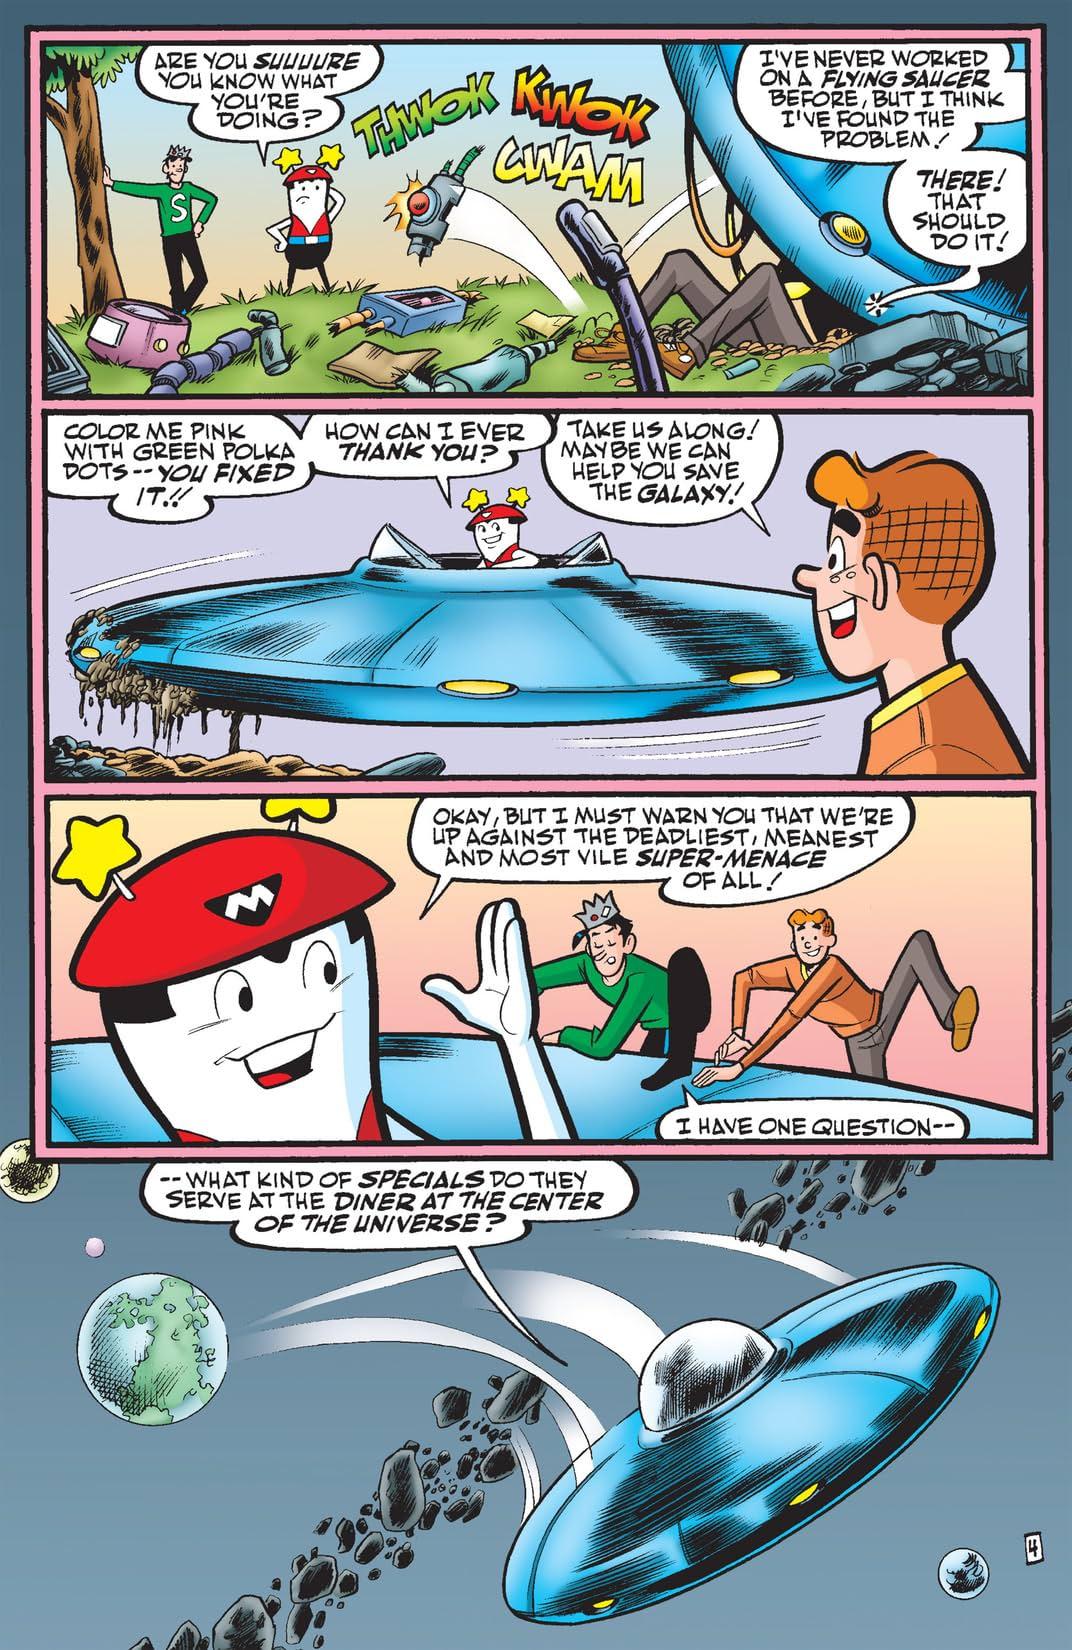 PEP Digital #100: Archie & Friends Adventures